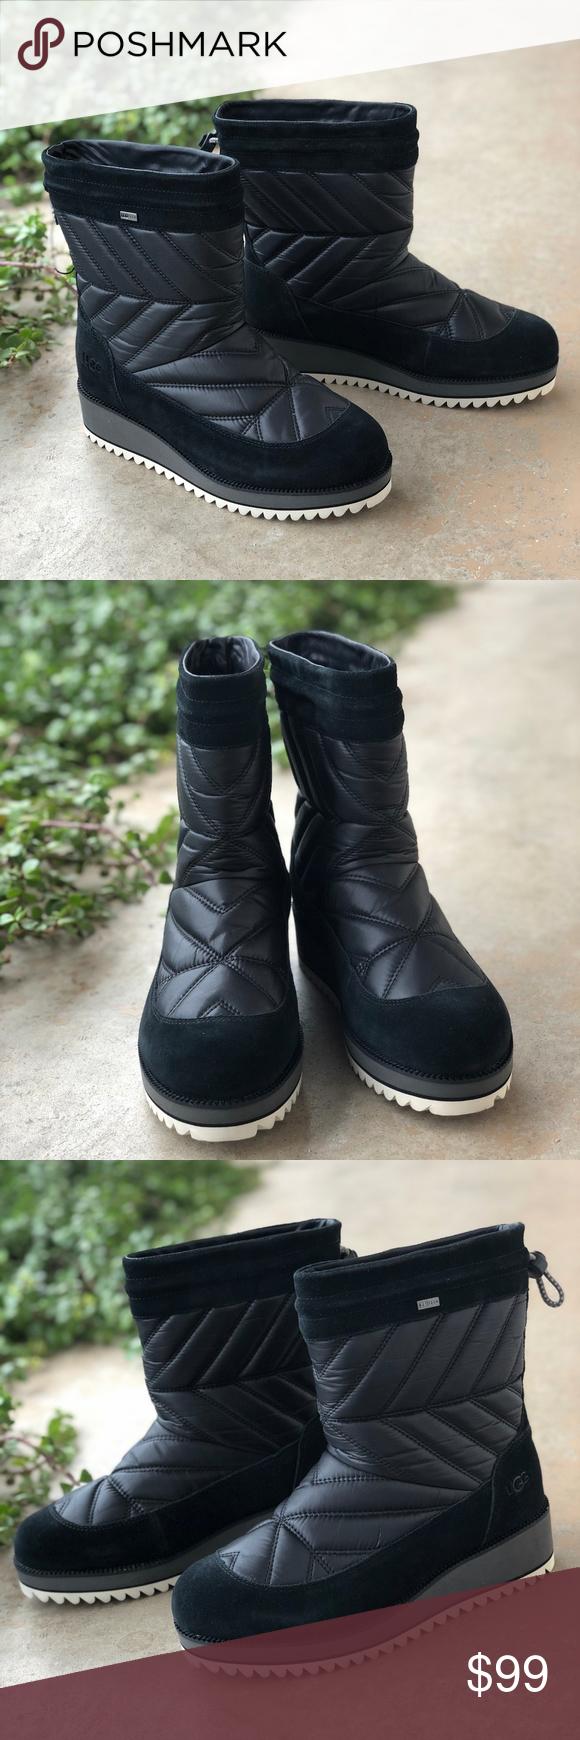 0a37f5fa9a2 UGG Black Beck Waterproof Quilt Puffer Boots Features: Waterproof ...